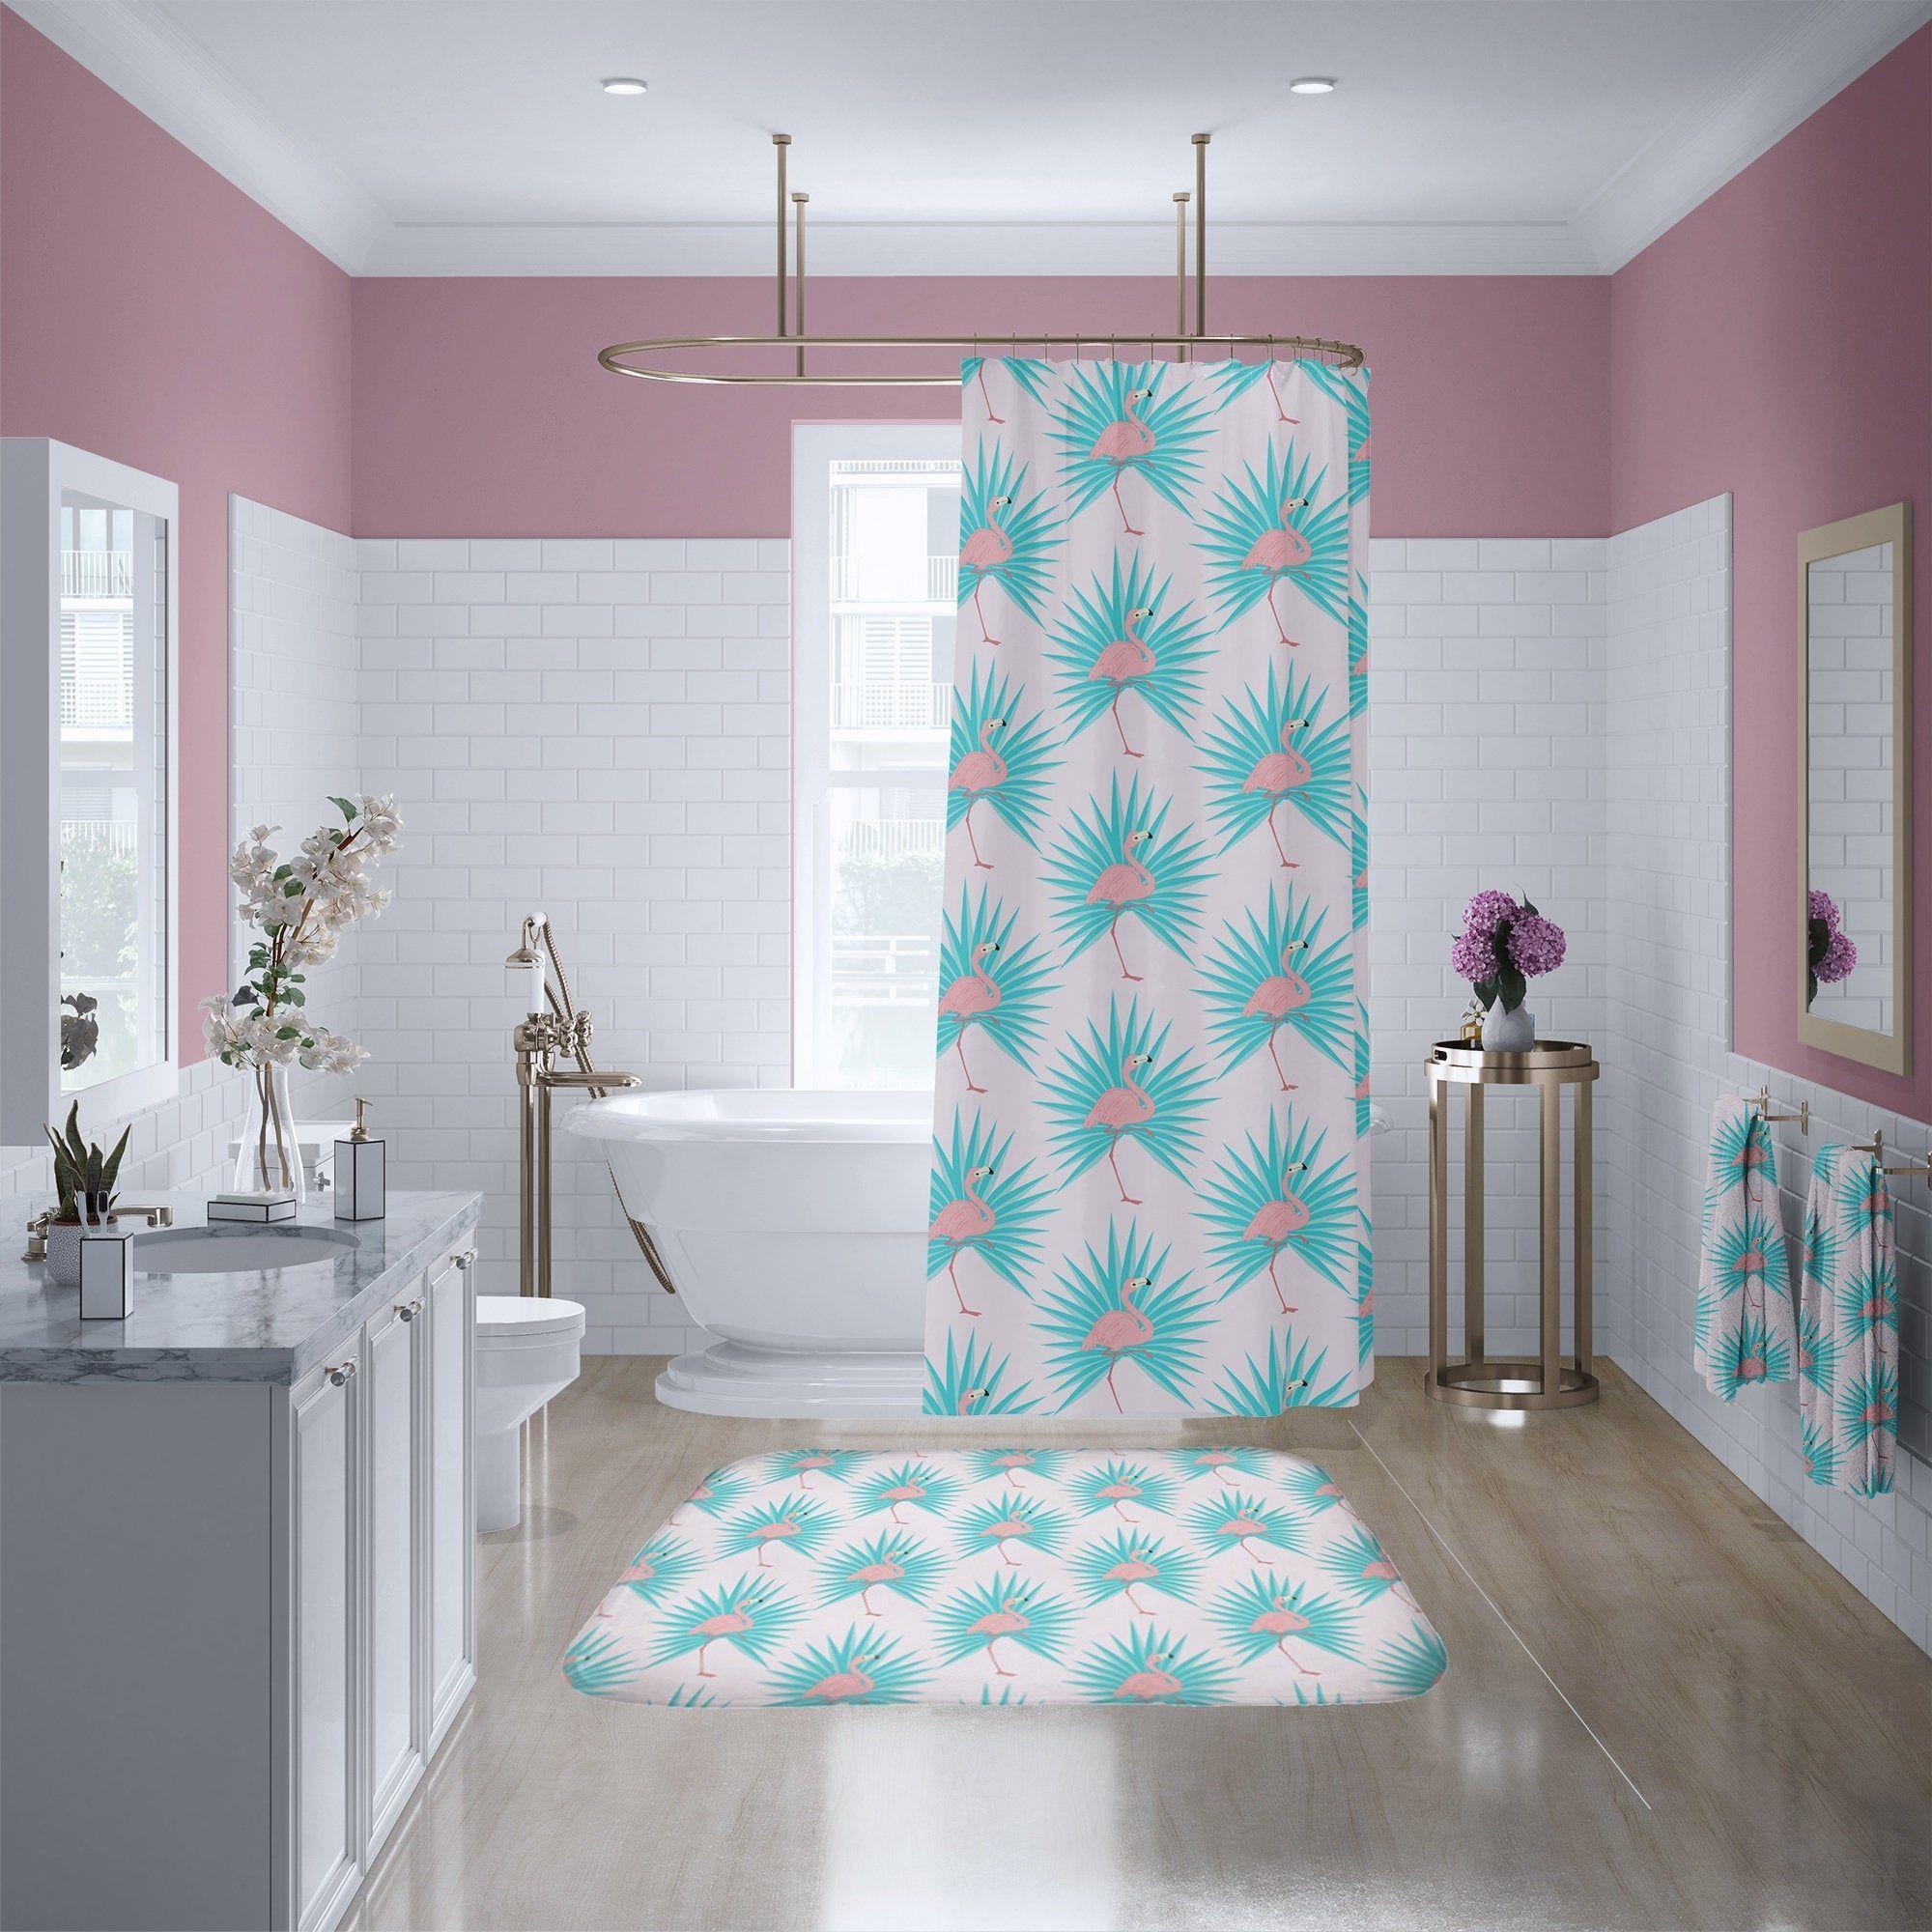 Bathroom Decor Australia Bathroom Decor Themes 90s Bathroom Decor Bathroom Decor Style Quiz Flowers For Bathroom Decor Bathroom 2020 Banyo Dekorasyonu Flamingo